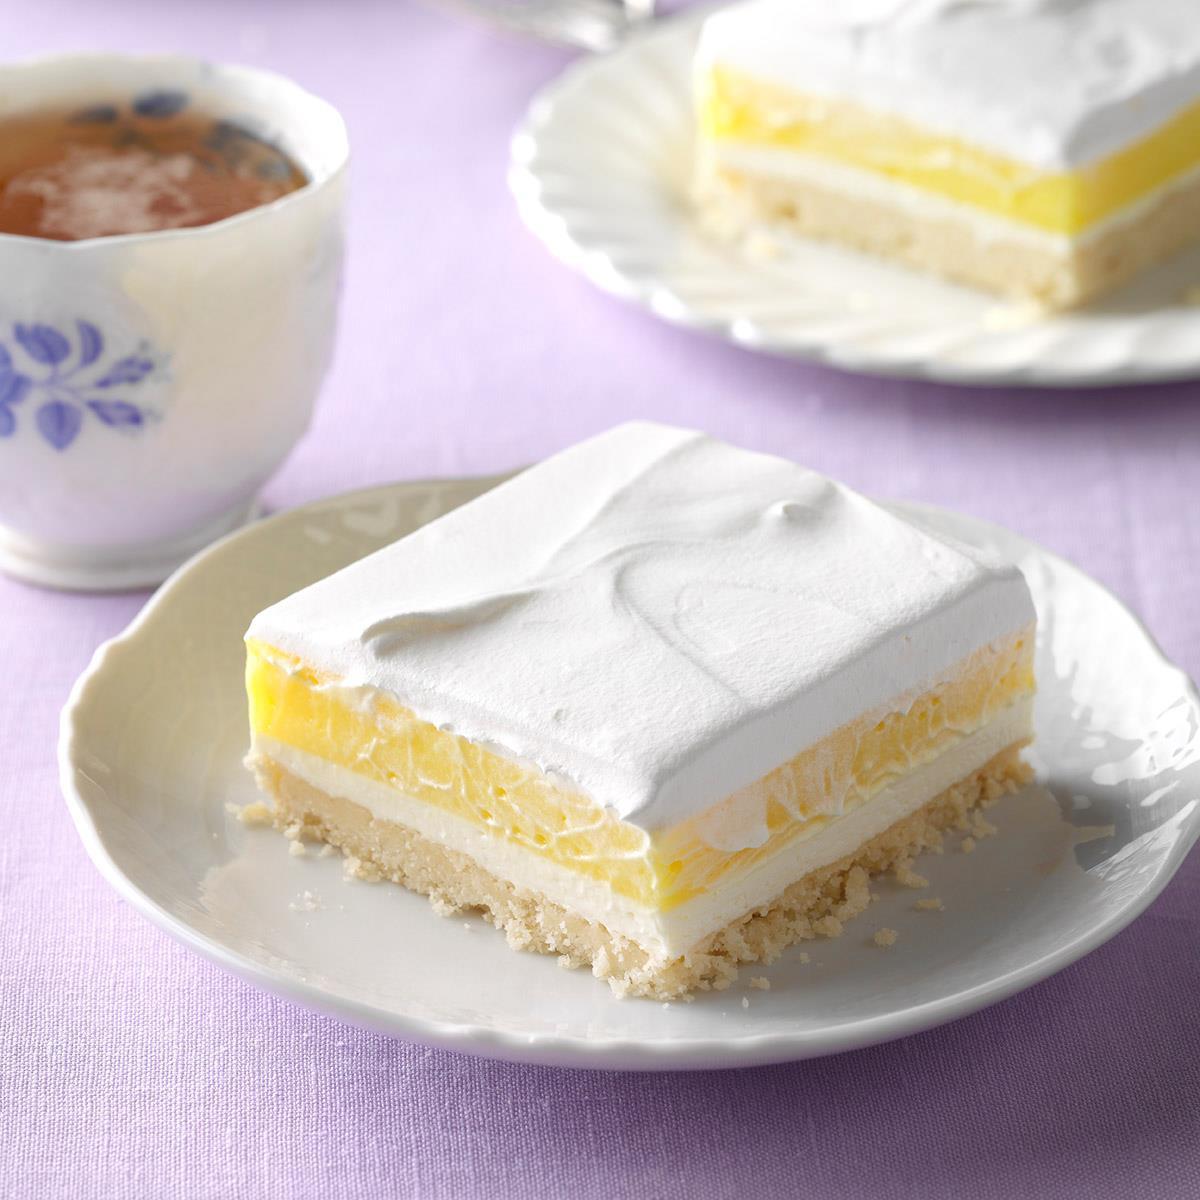 Lemon Pudding Desserts  Lemon Pudding Dessert Recipe